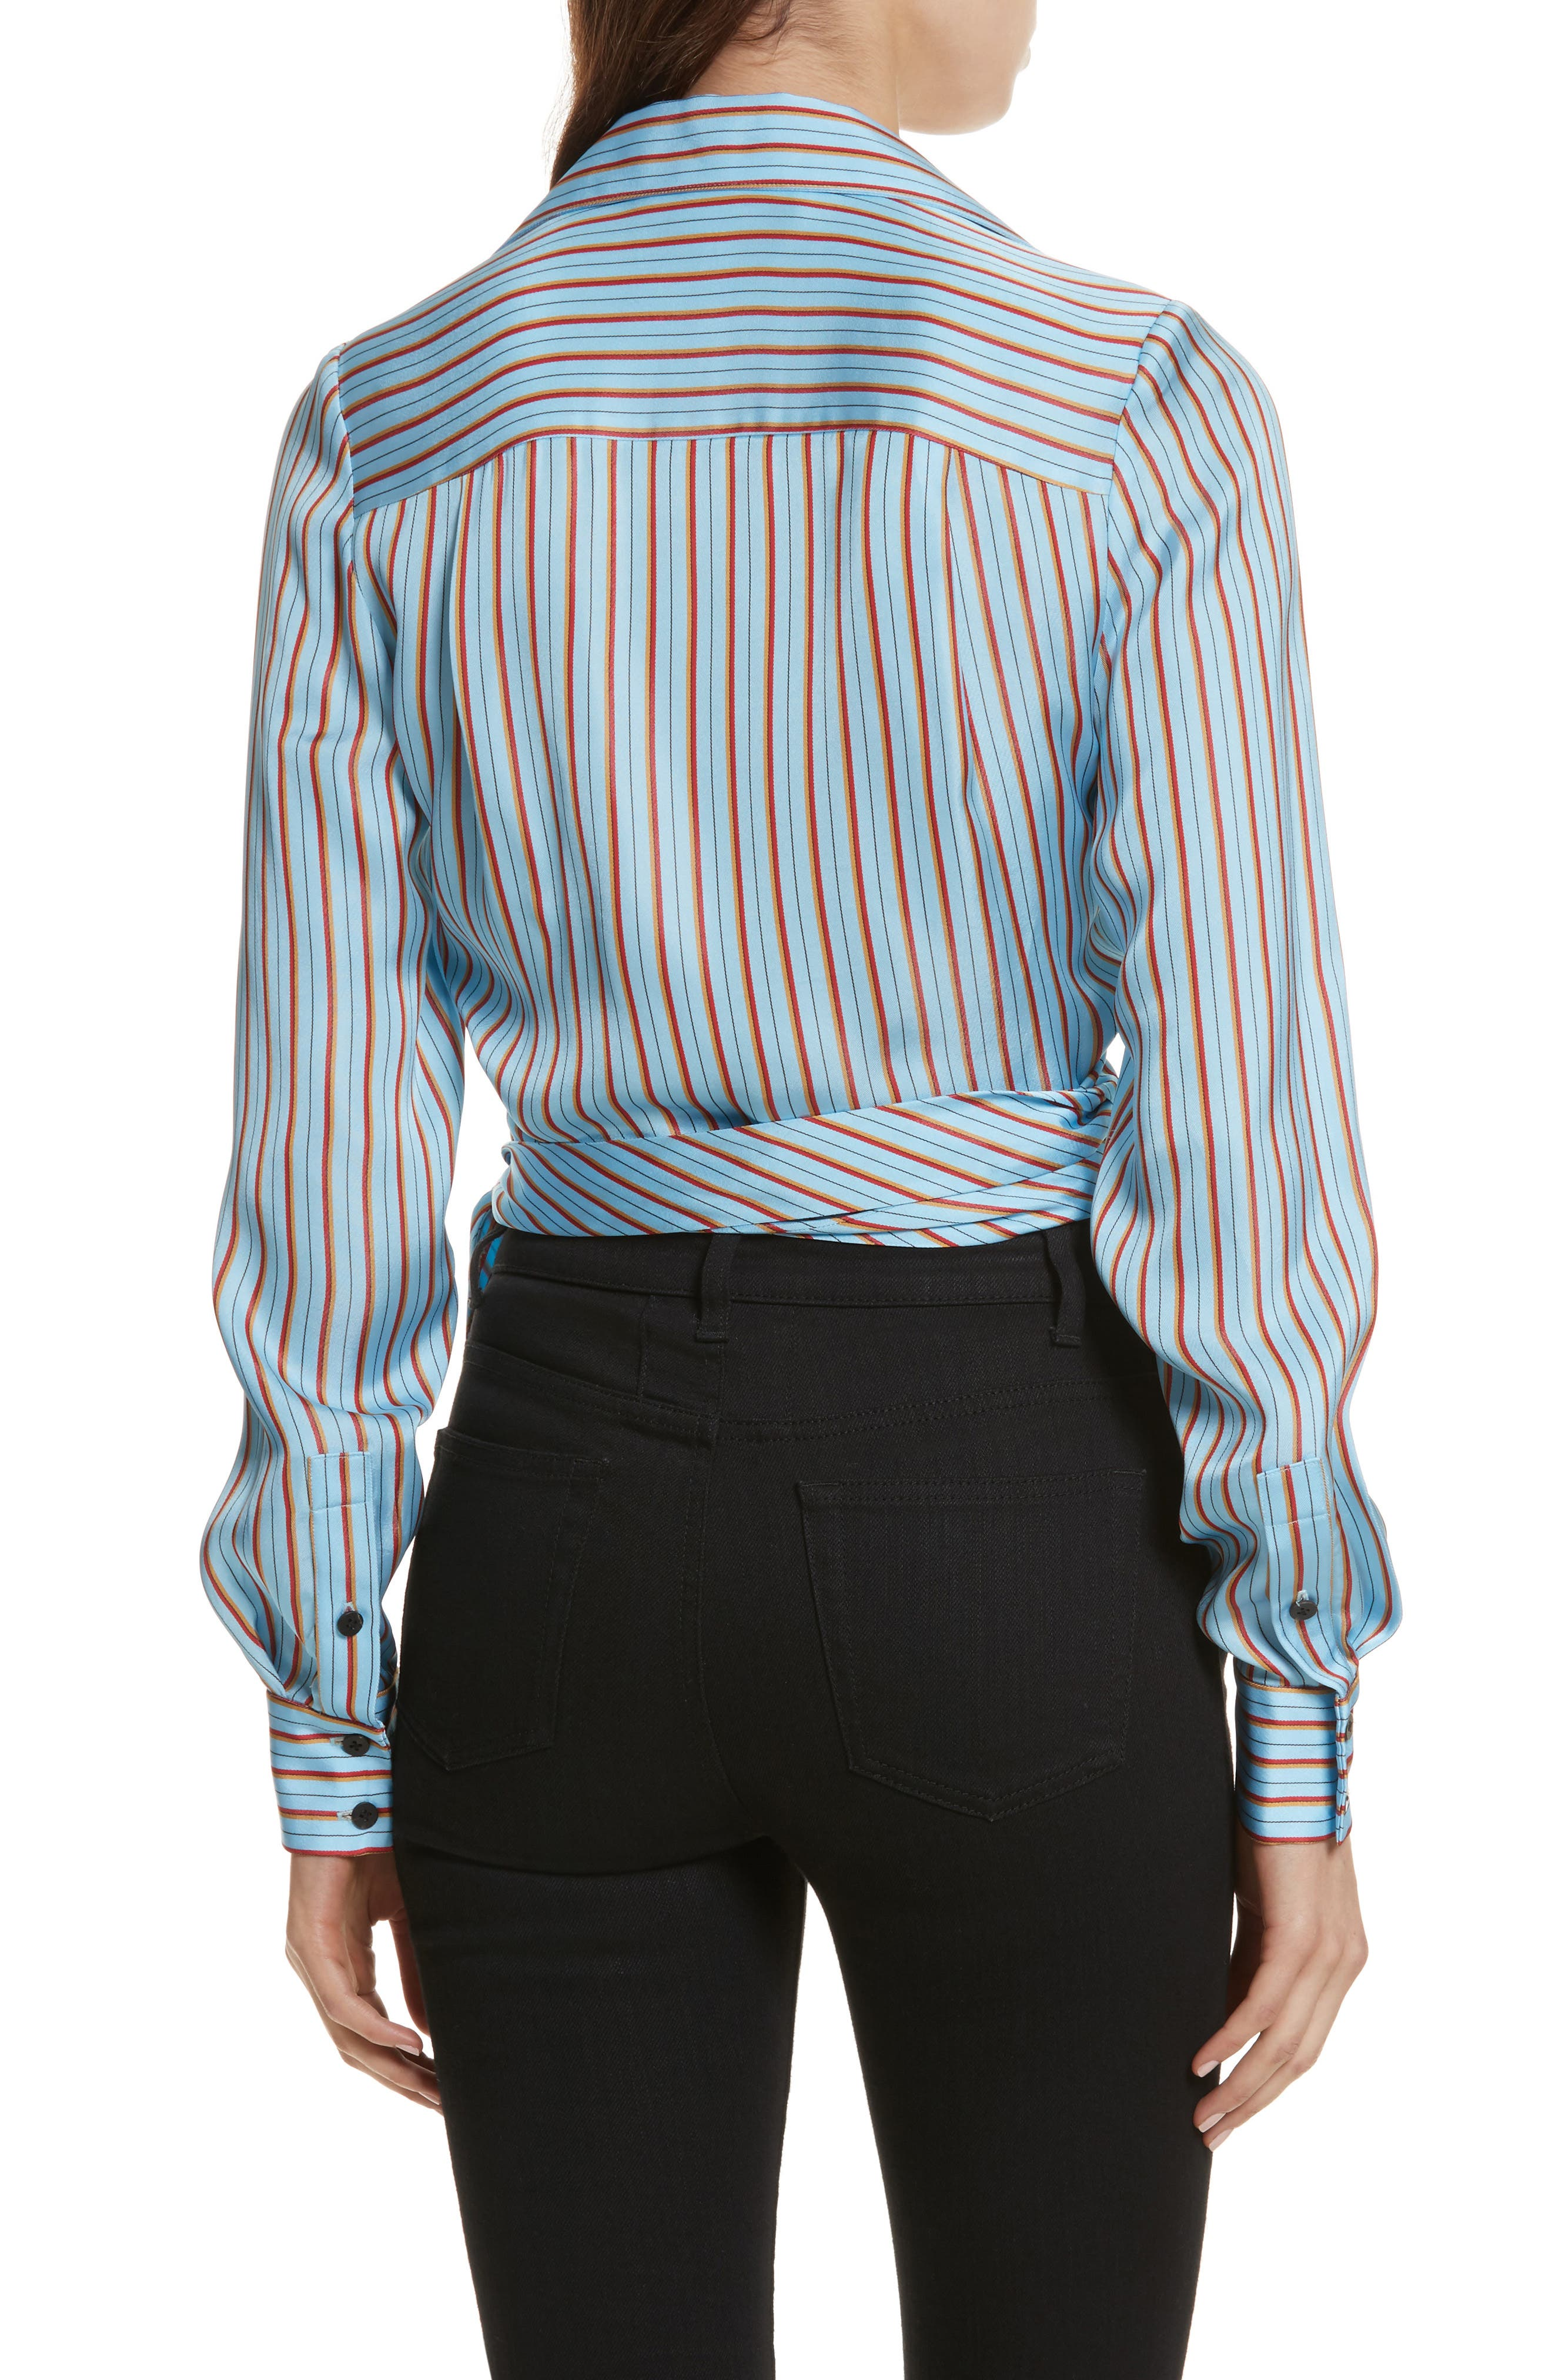 Diane von Furstenberg Stripe Wrap Top,                             Alternate thumbnail 2, color,                             477